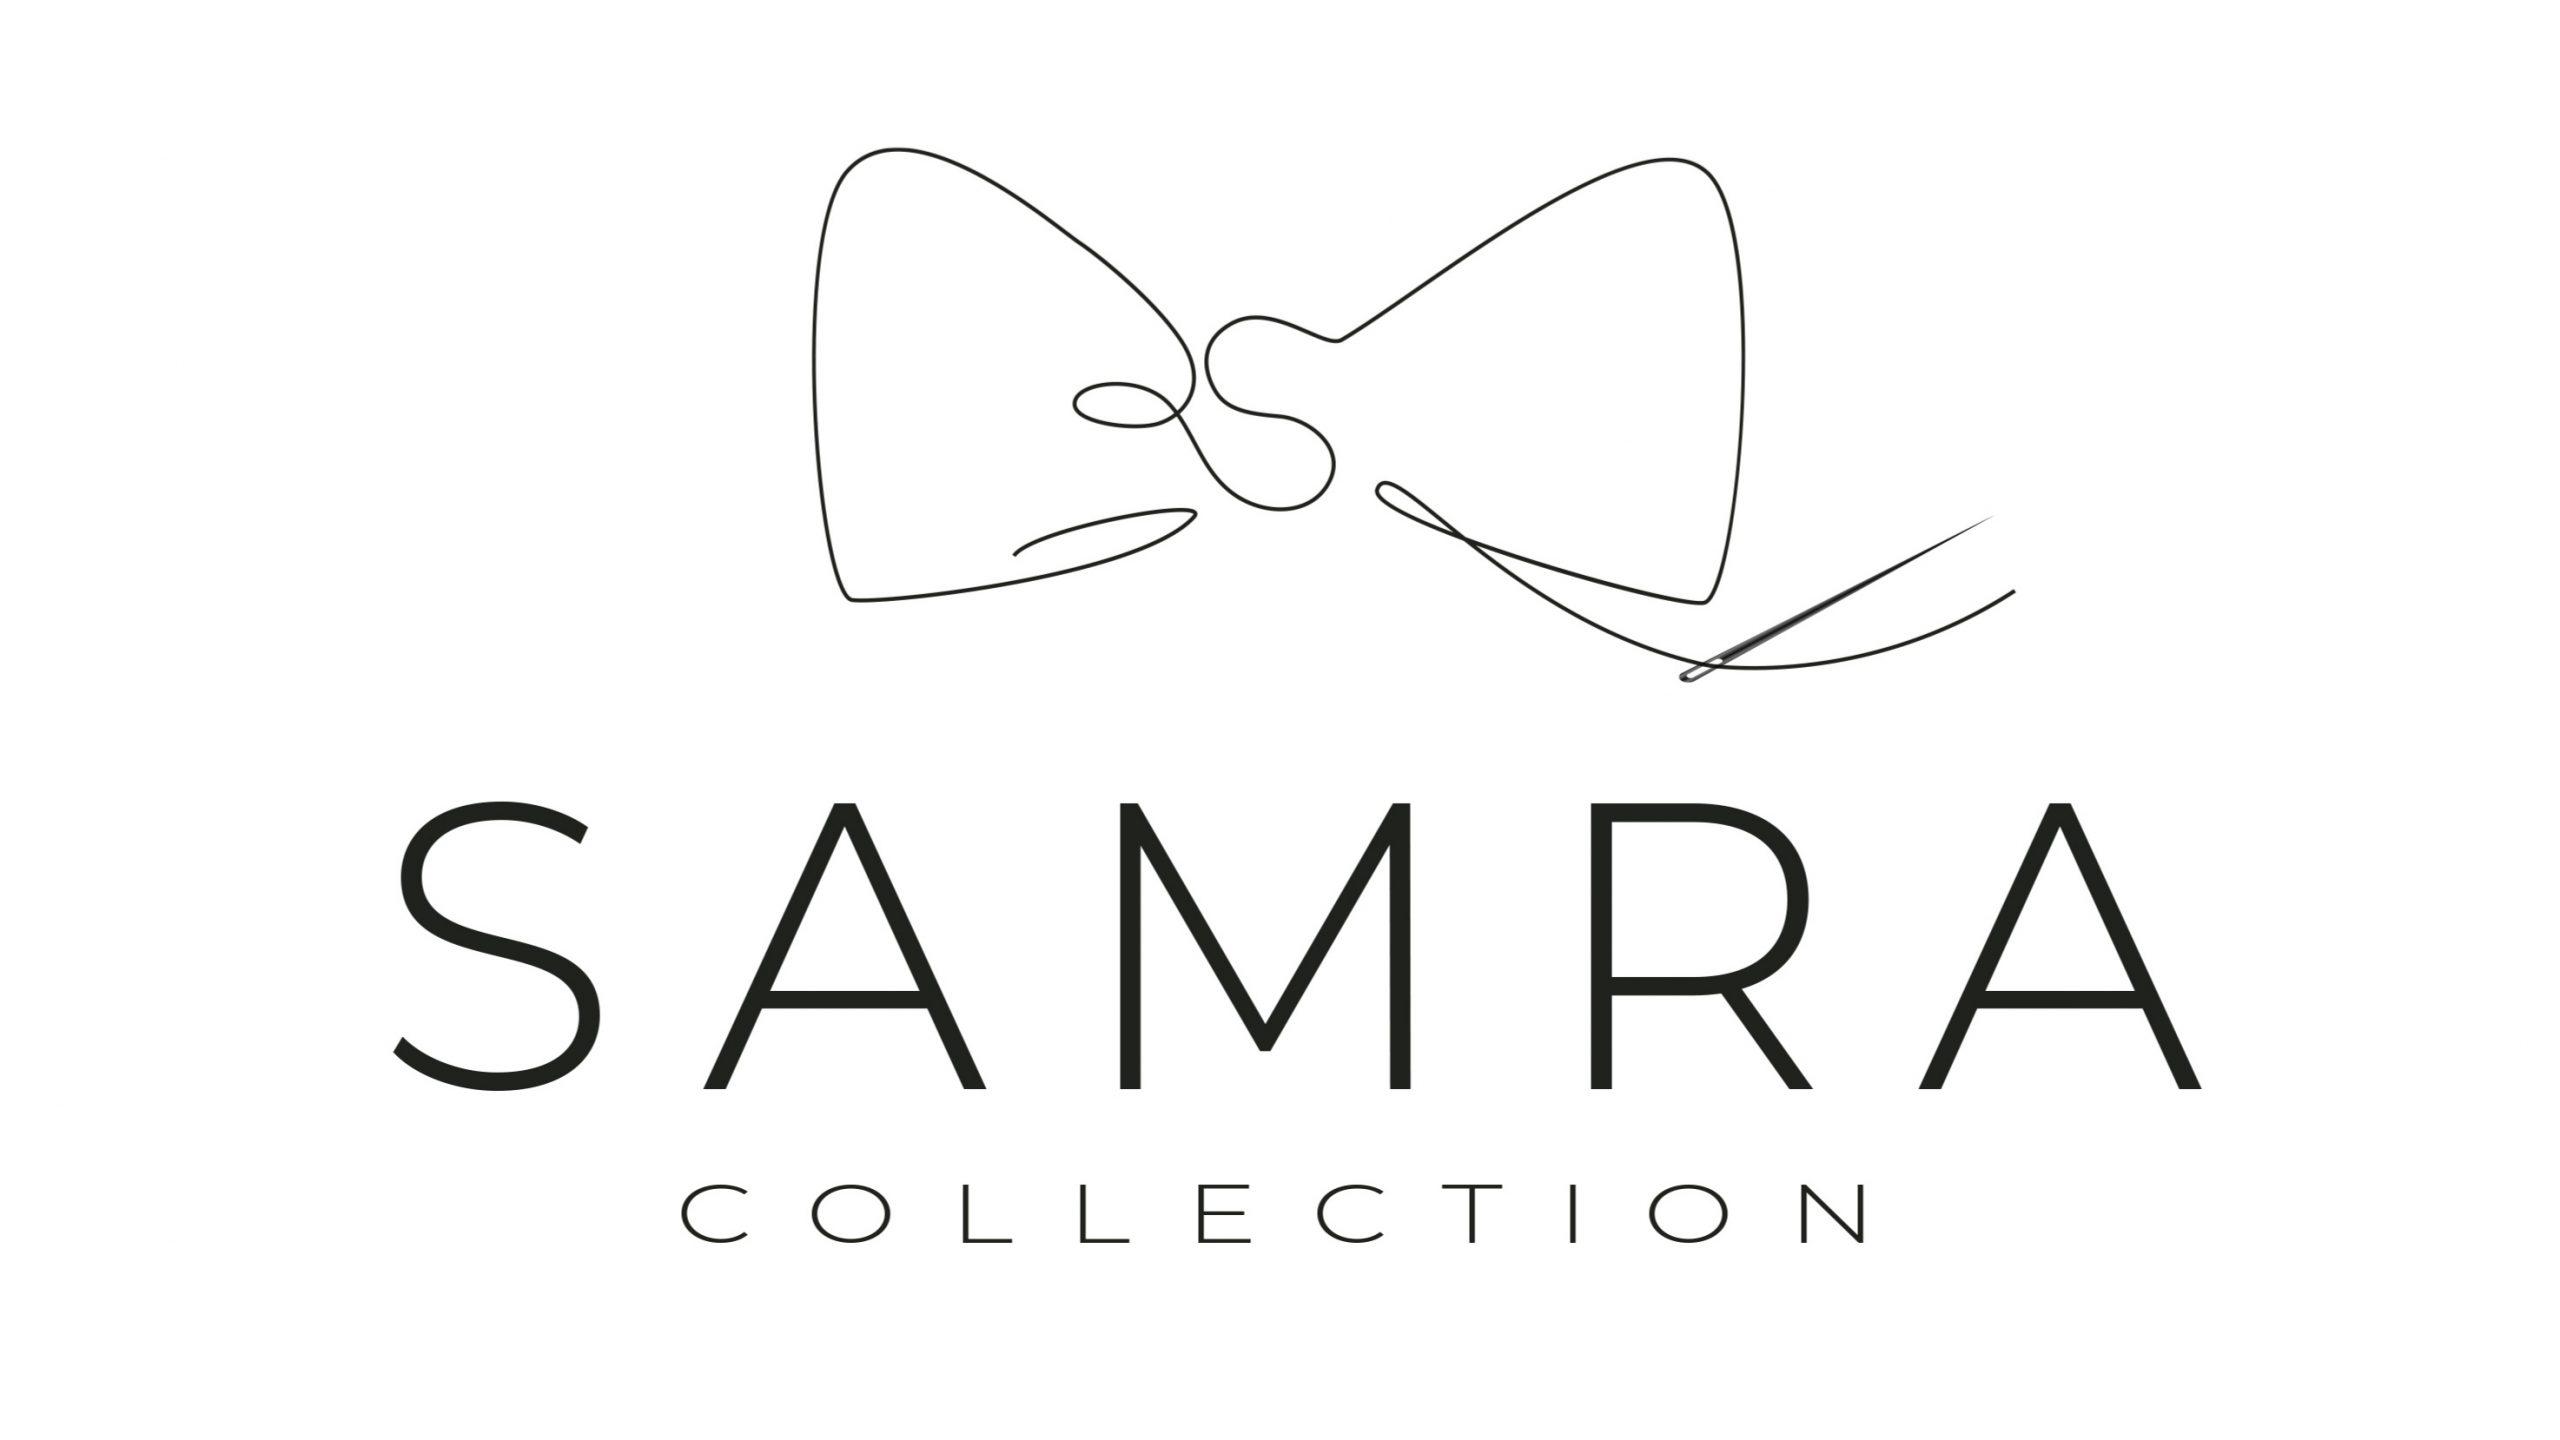 Samra Collection